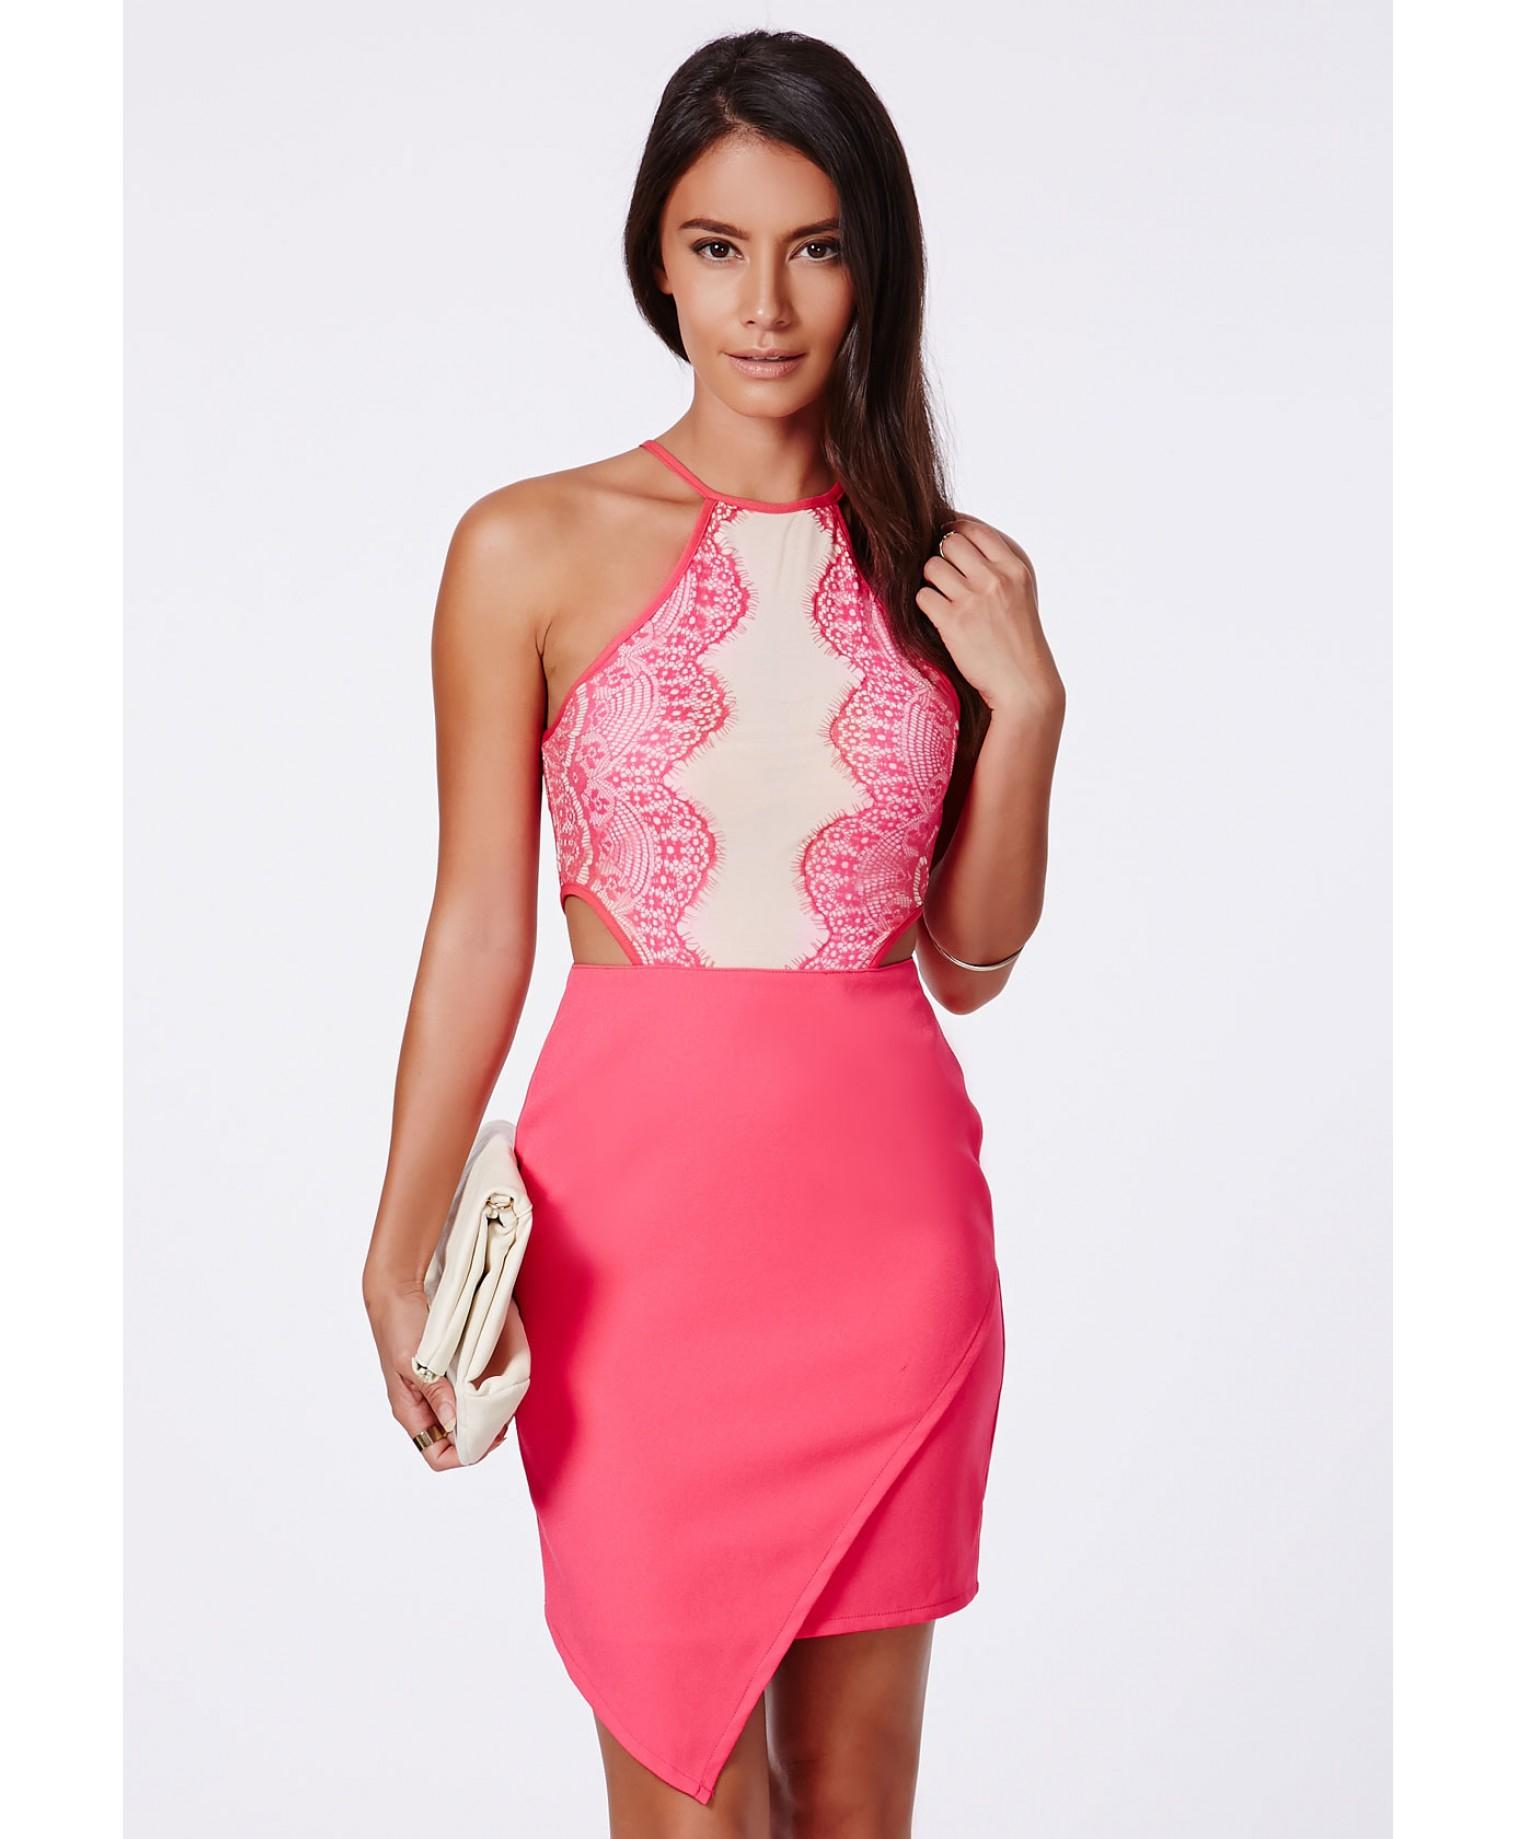 c11a101775a218 Missguided Zipita Pink Lace Top Asymmetric Mini Dress - Campaign in ...